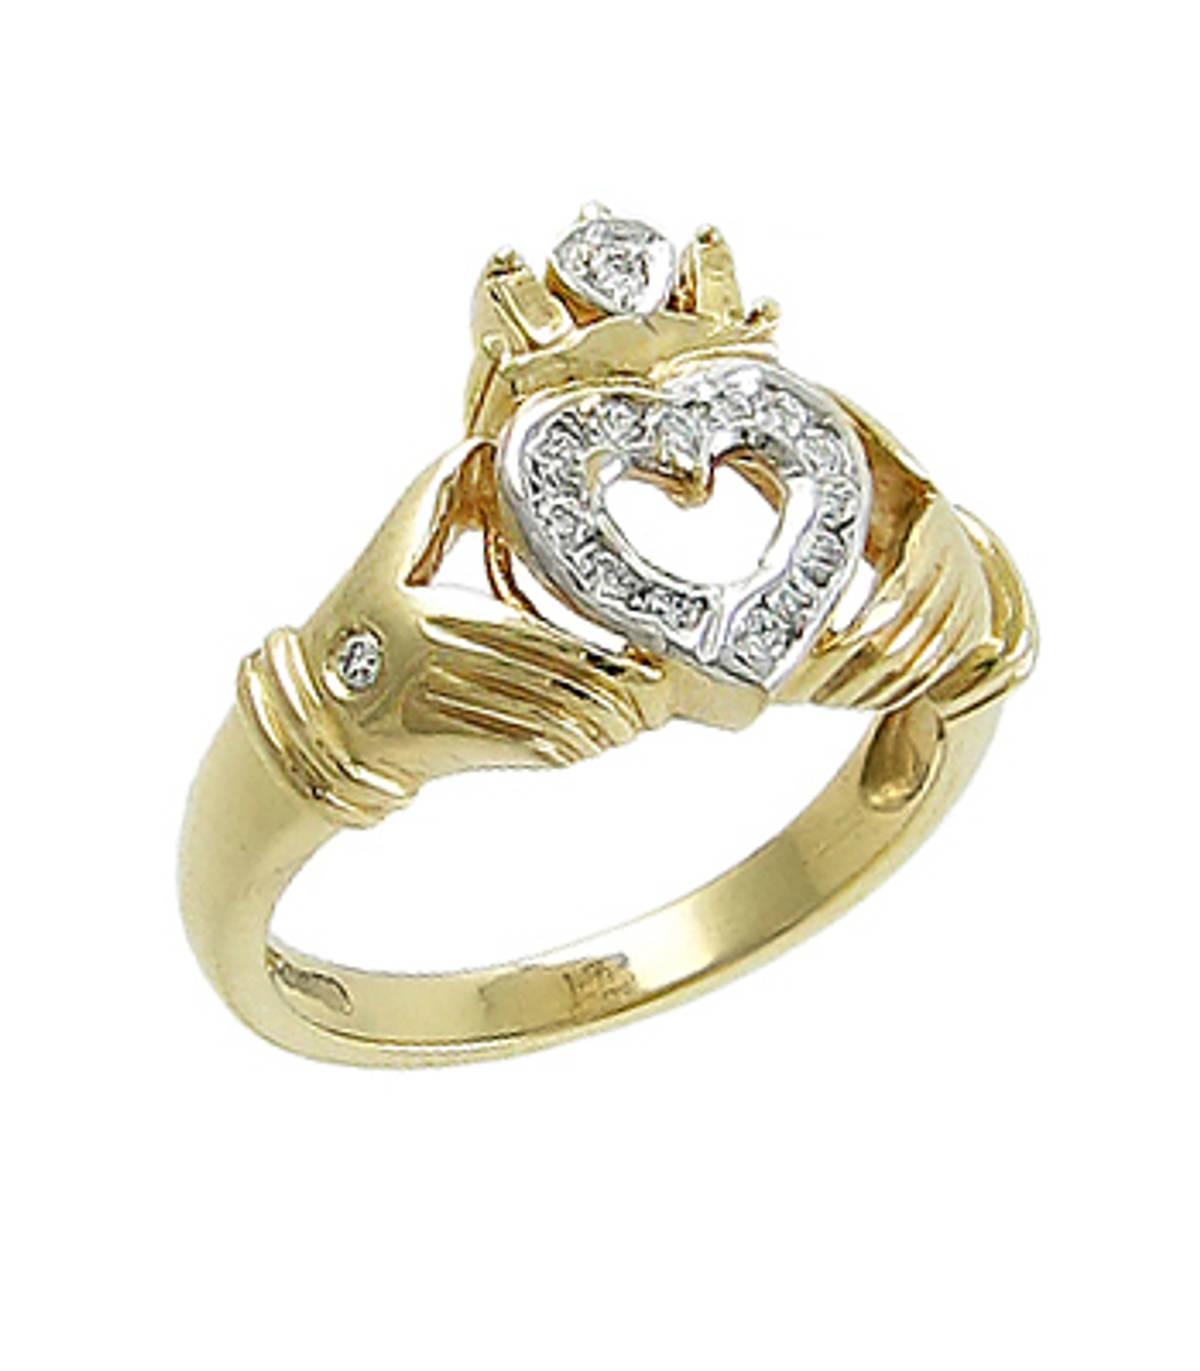 Irish made14 carat yellow gold 0.17cts diamonds claddagh engagement ring